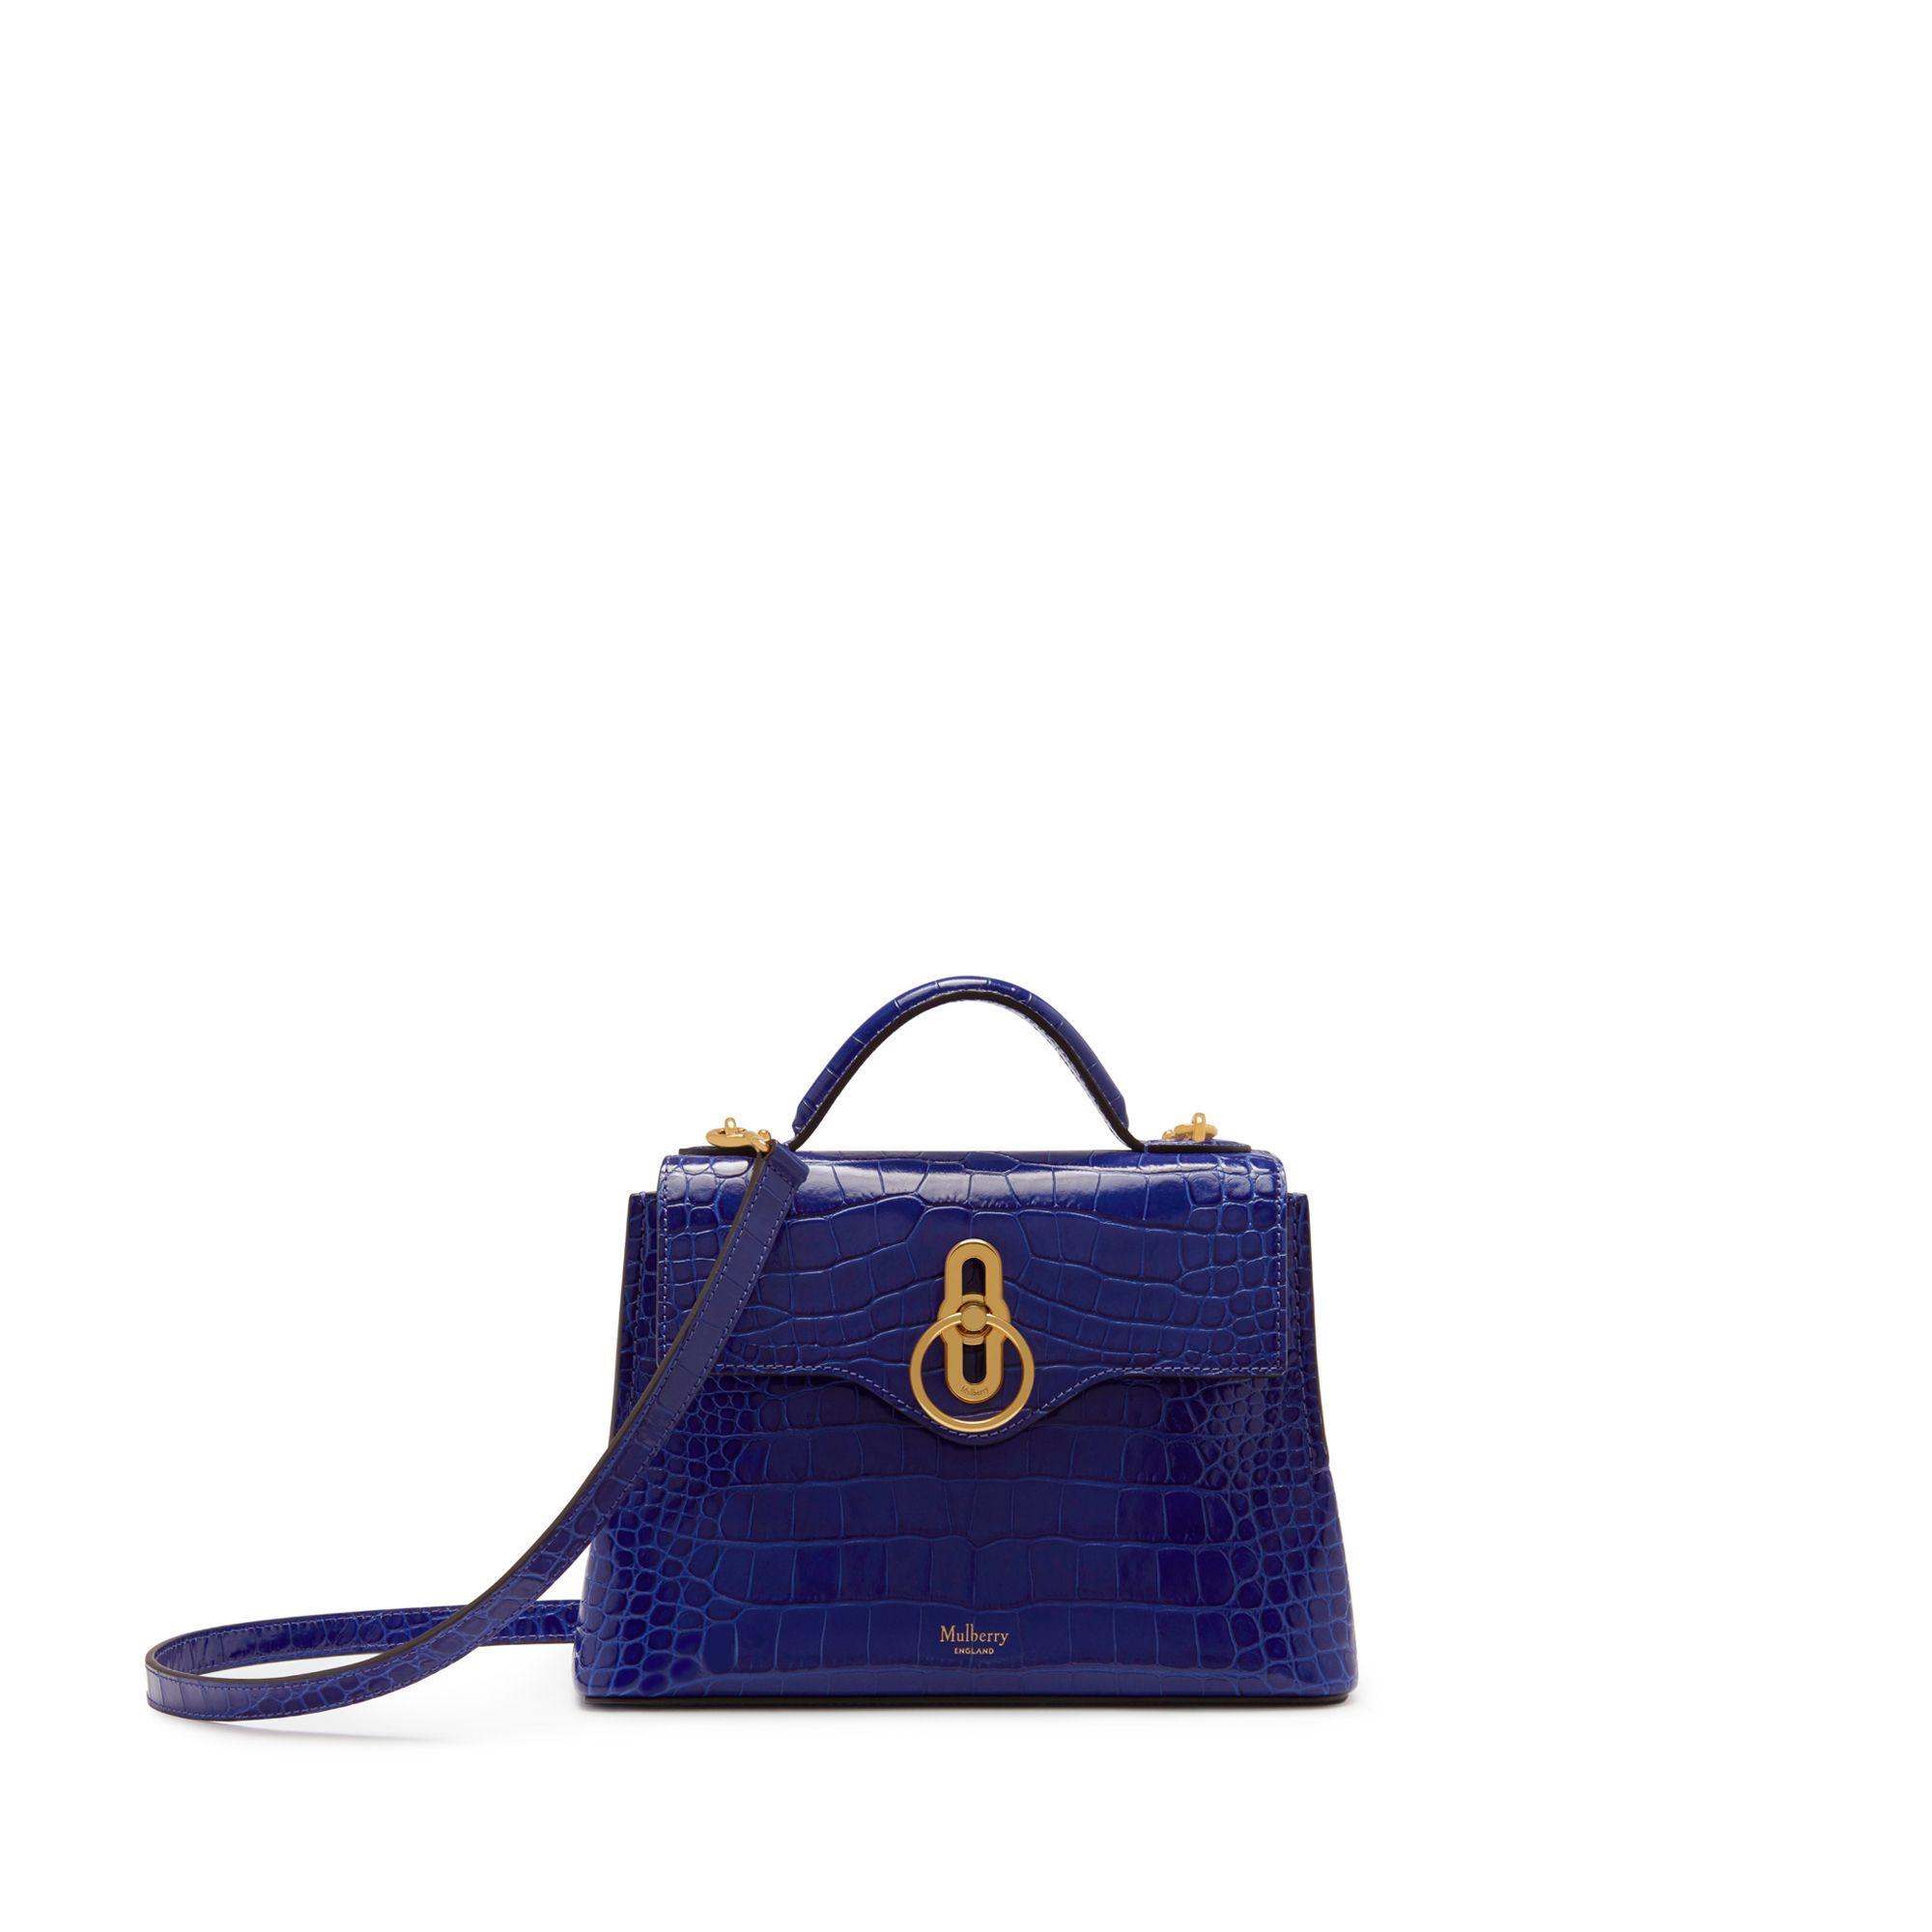 In Love Top Handle Denim Shoulder Bag